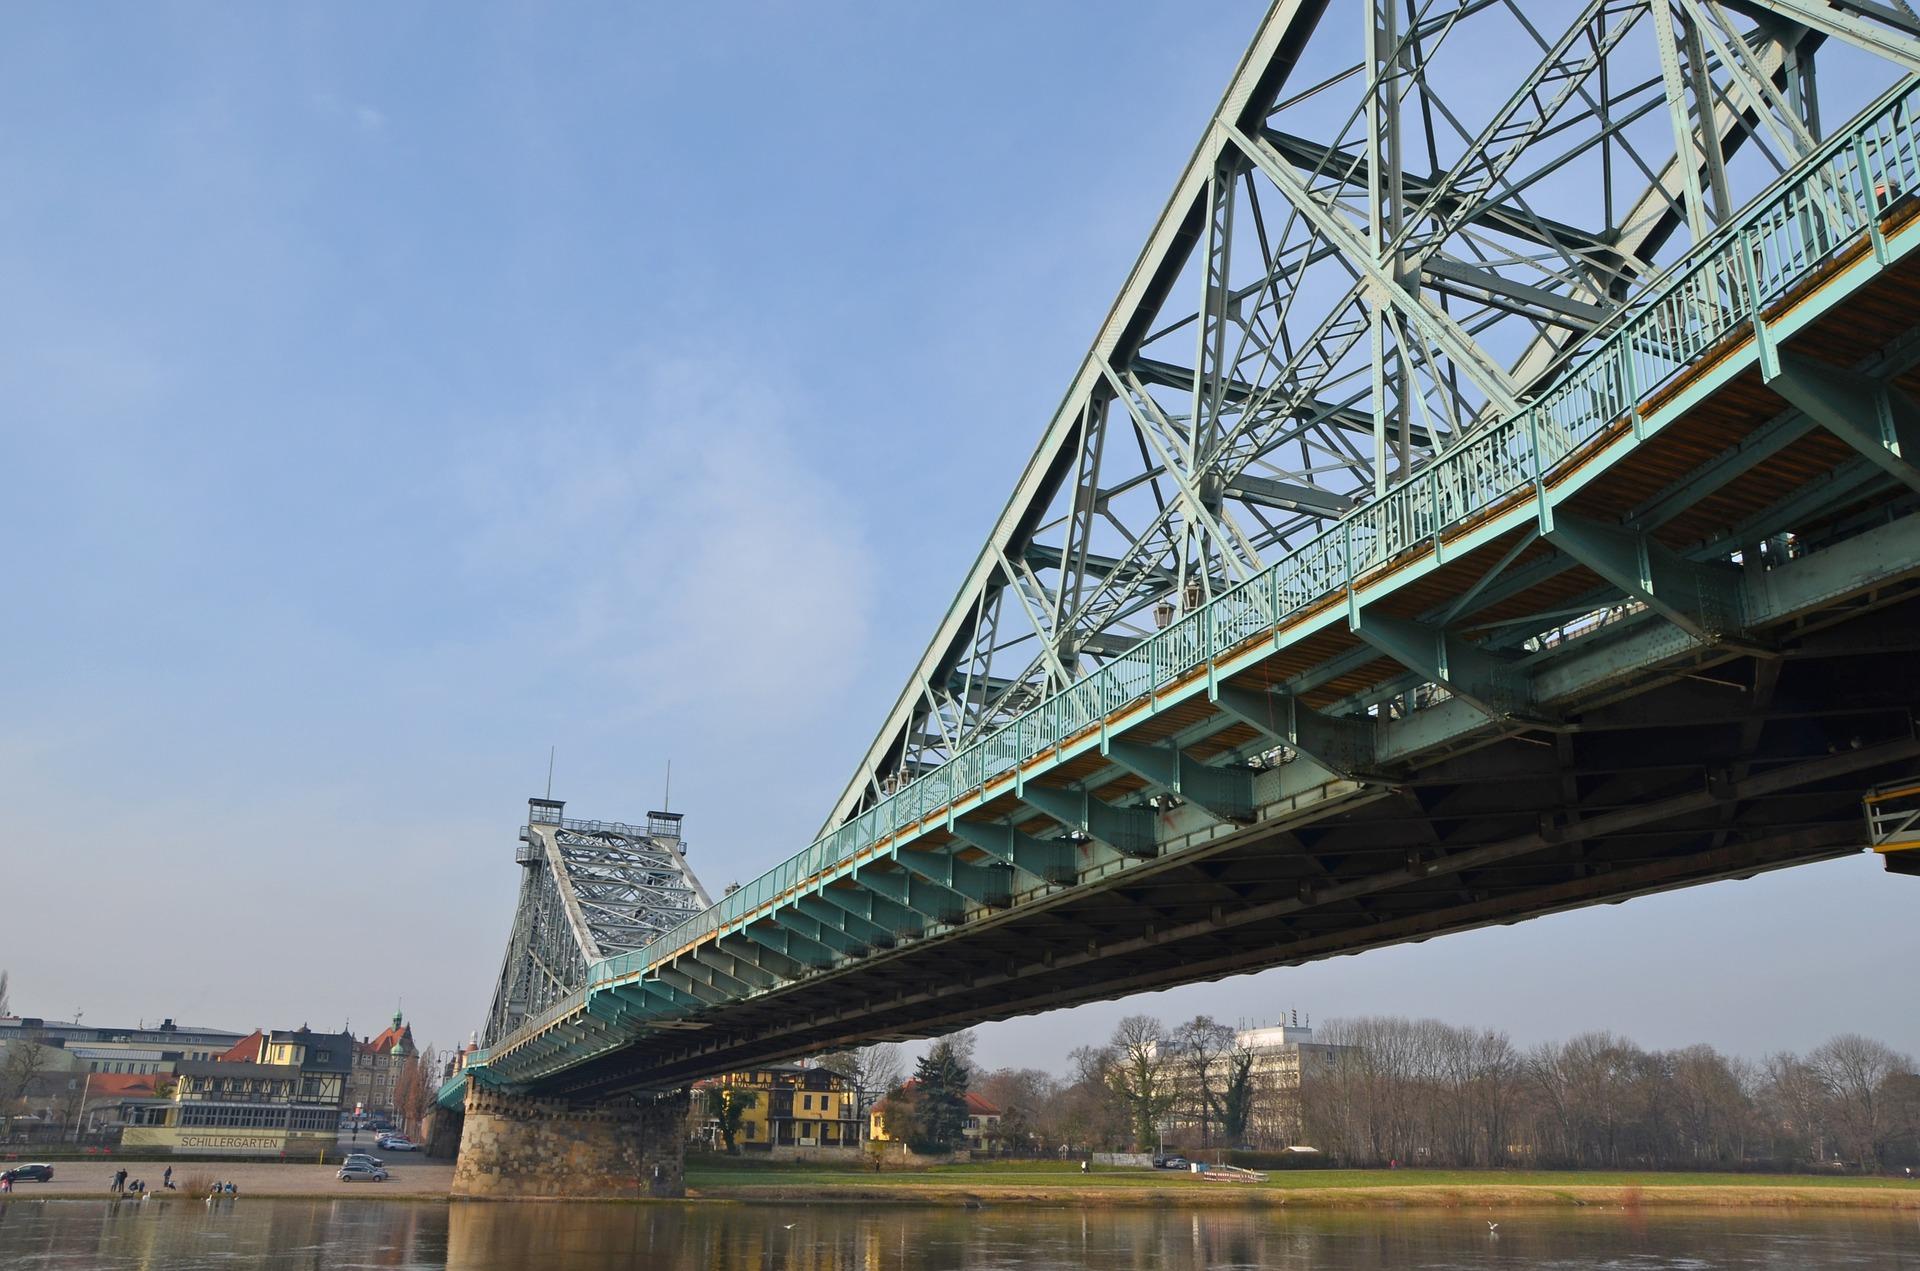 Top 10 Liebesschloss-Brücken -alle Ziele buchbar auf Reise